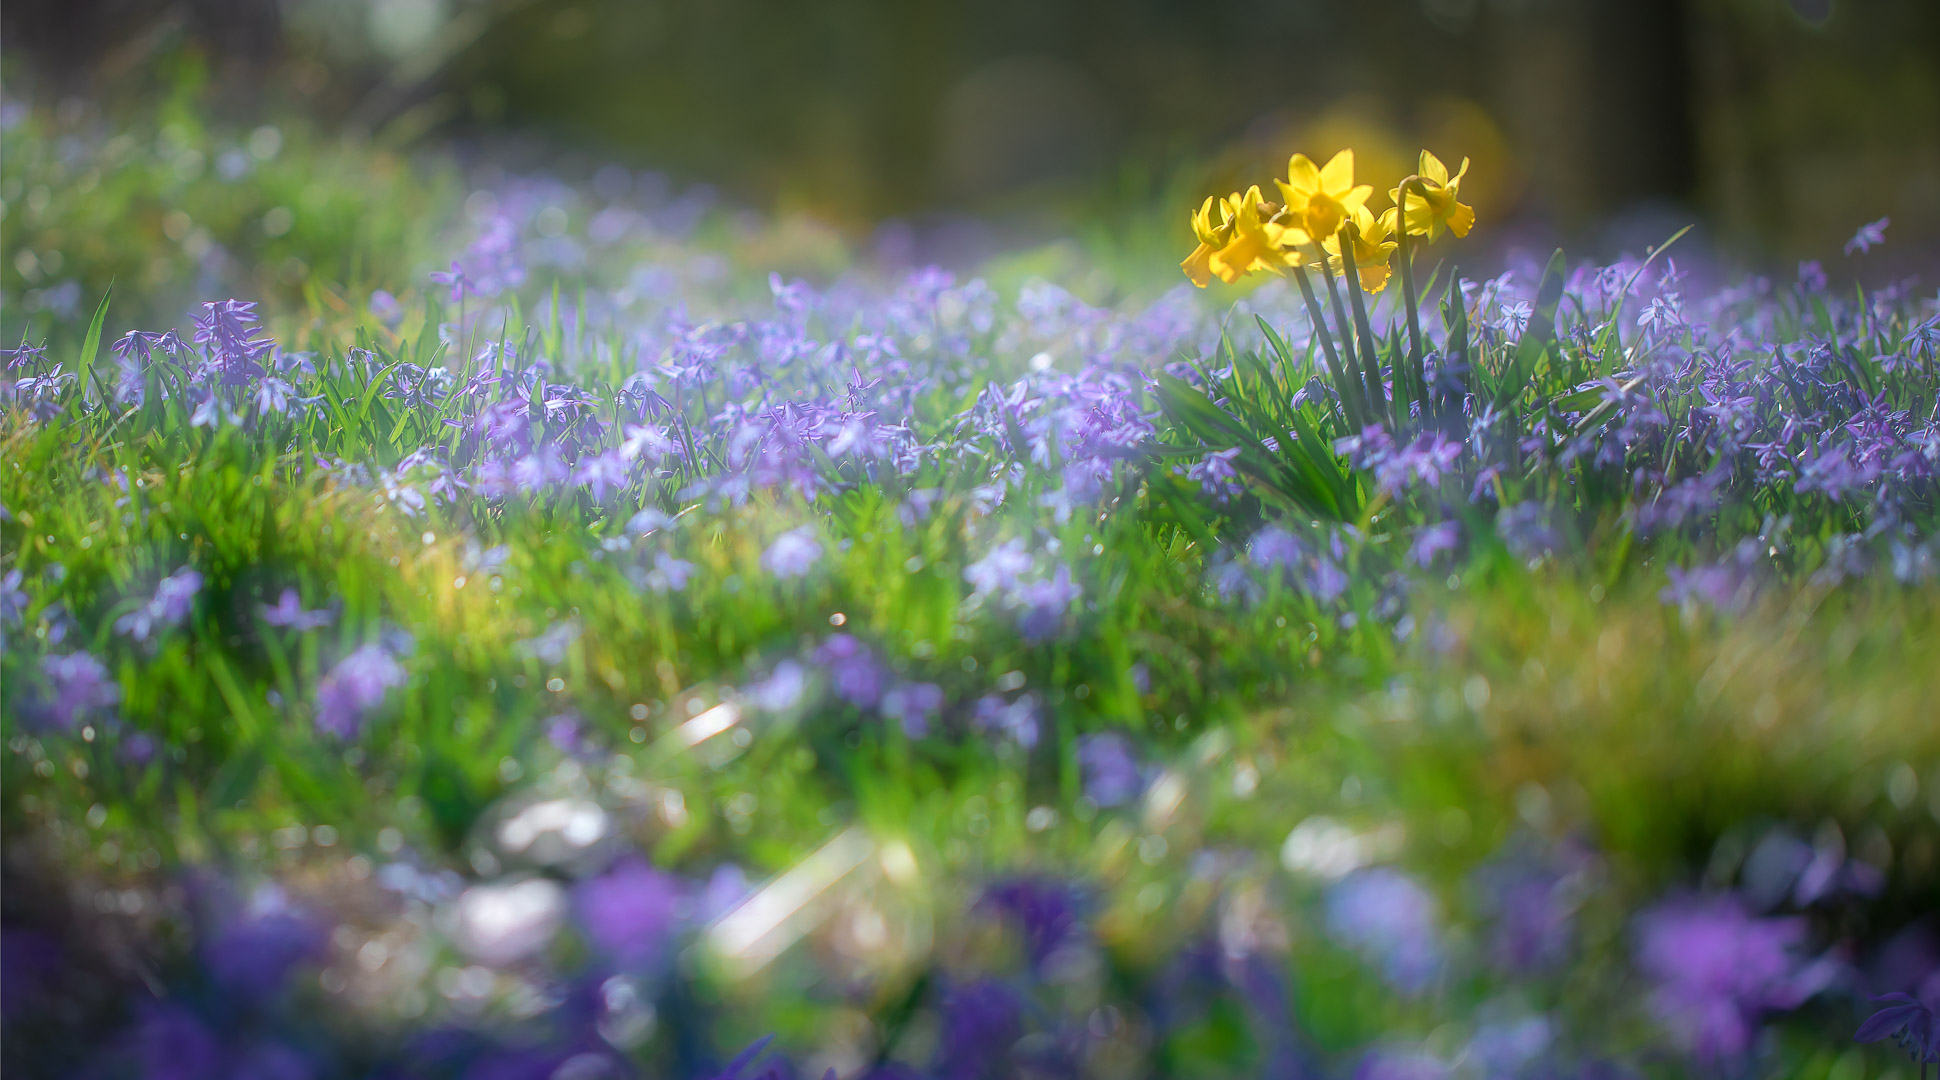 Frühlingserwachen / awakening of spring